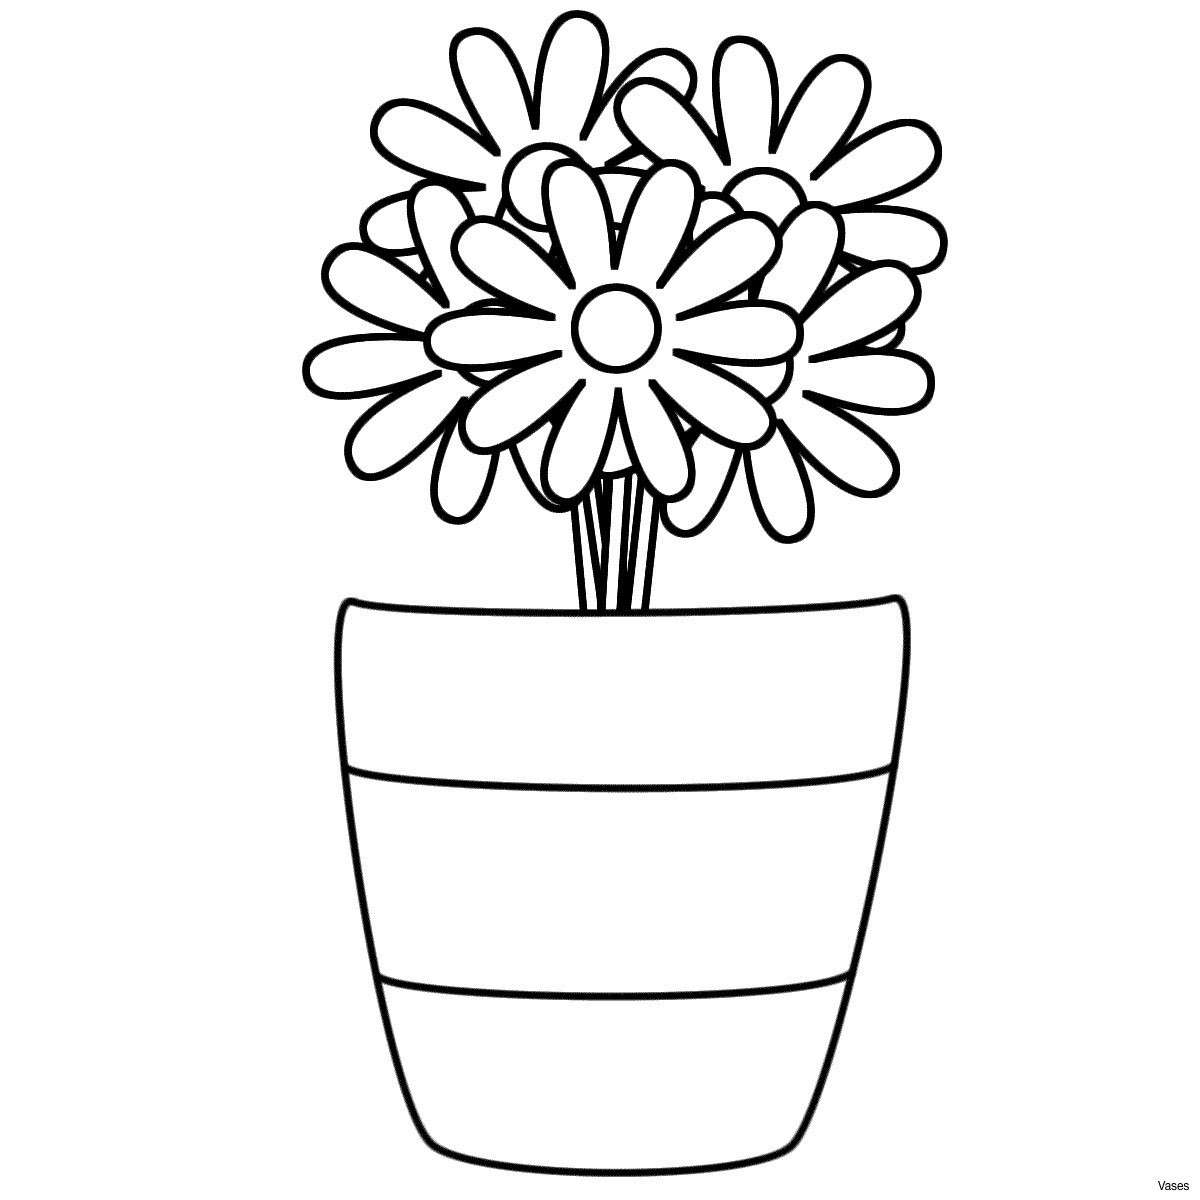 blue flowers in vase of 23 awesome flower vase clipart black and white flower decoration ideas intended for flower vase clipart black and white fresh fresh laptop clipart benjaminherman